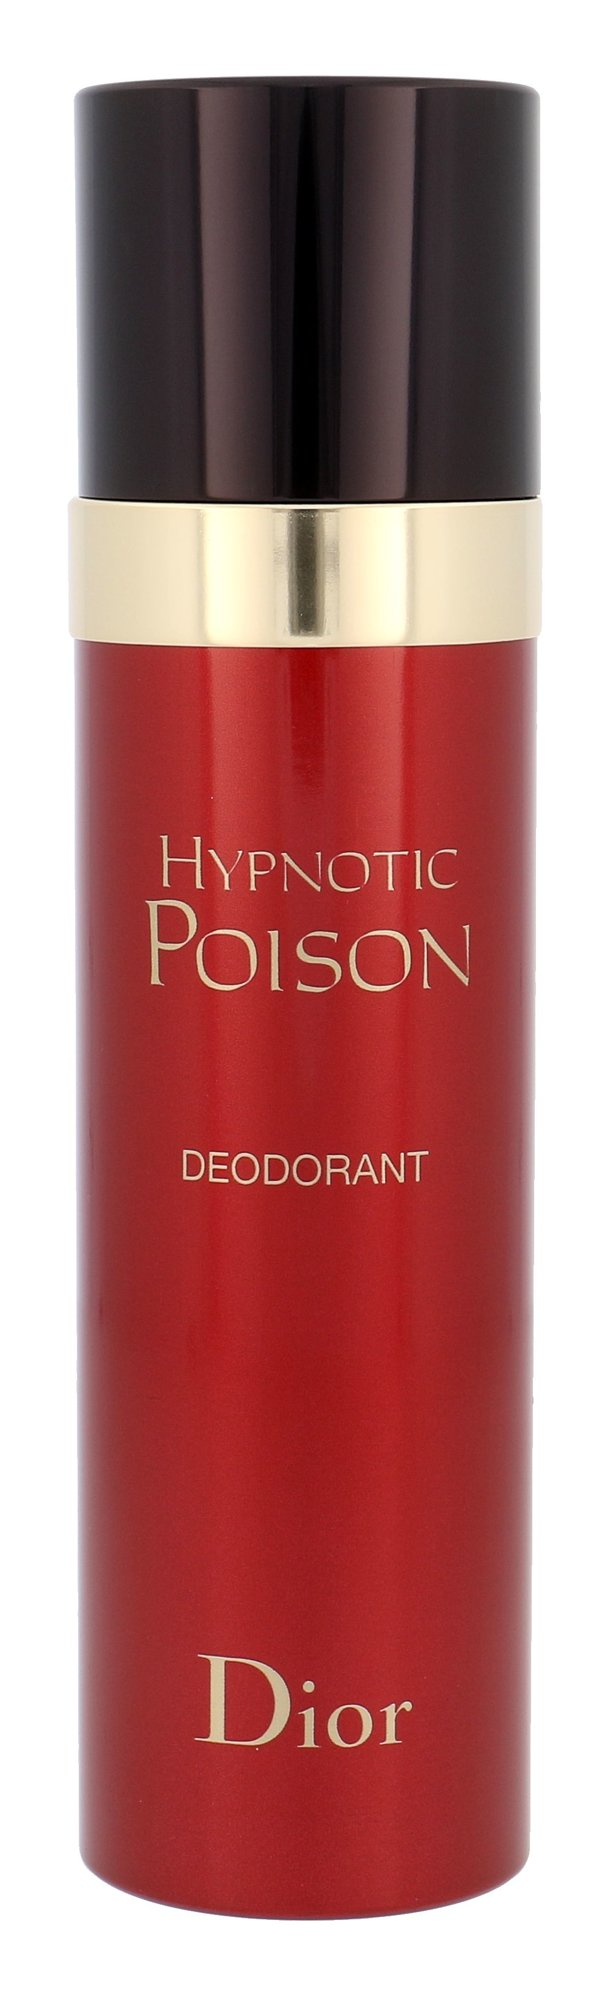 Christian Dior Hypnotic Poison Deodorant 100ml